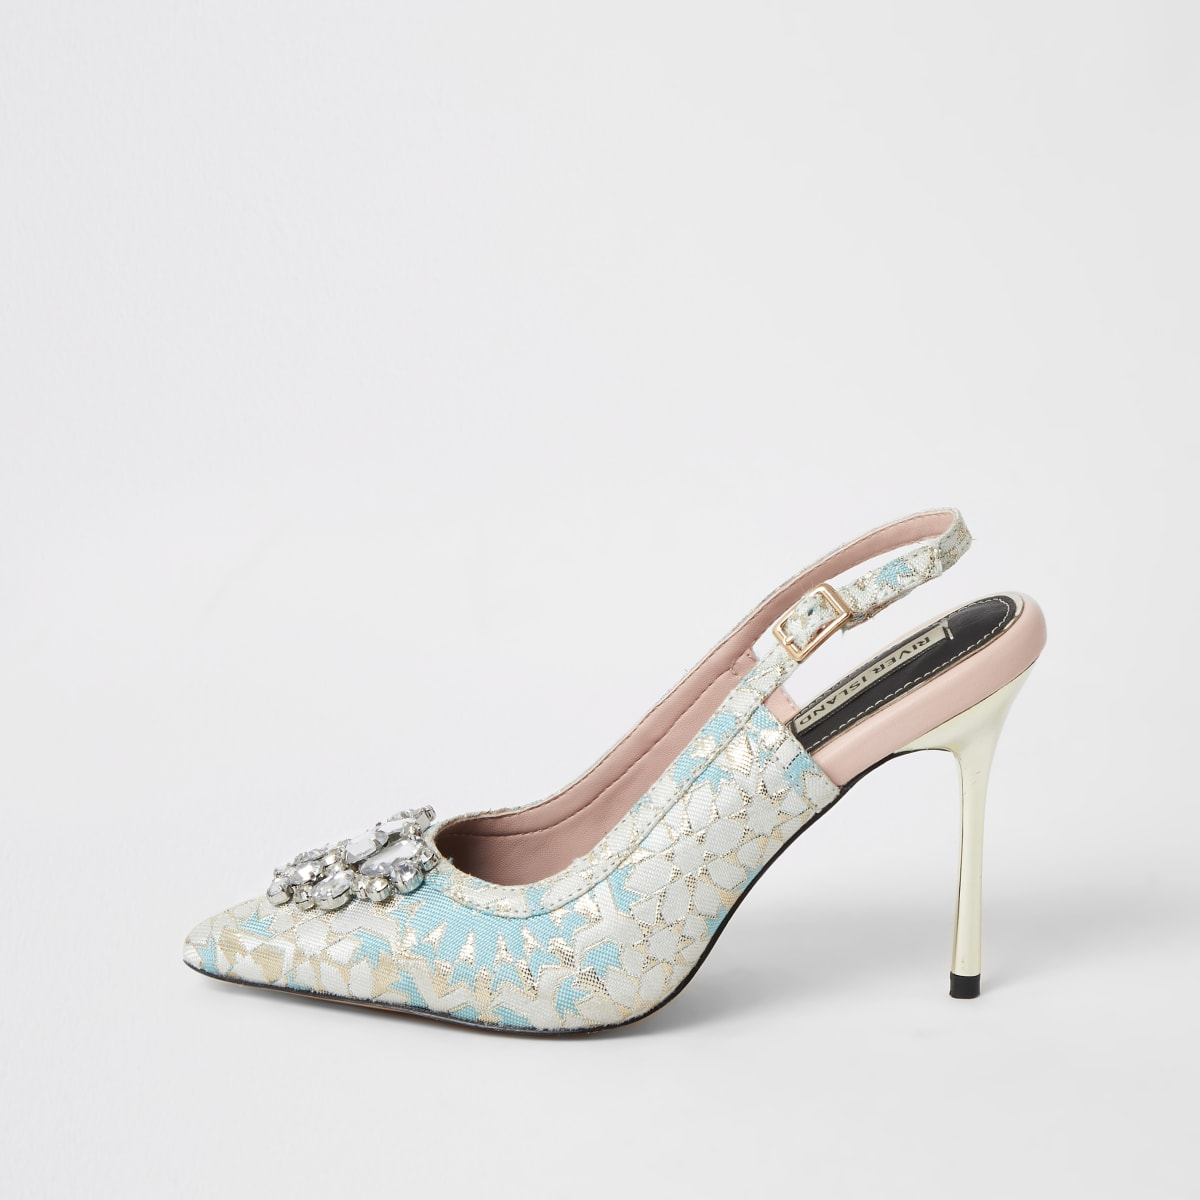 Chaussuresà talons et bride arrièreen jacquard ornébleu